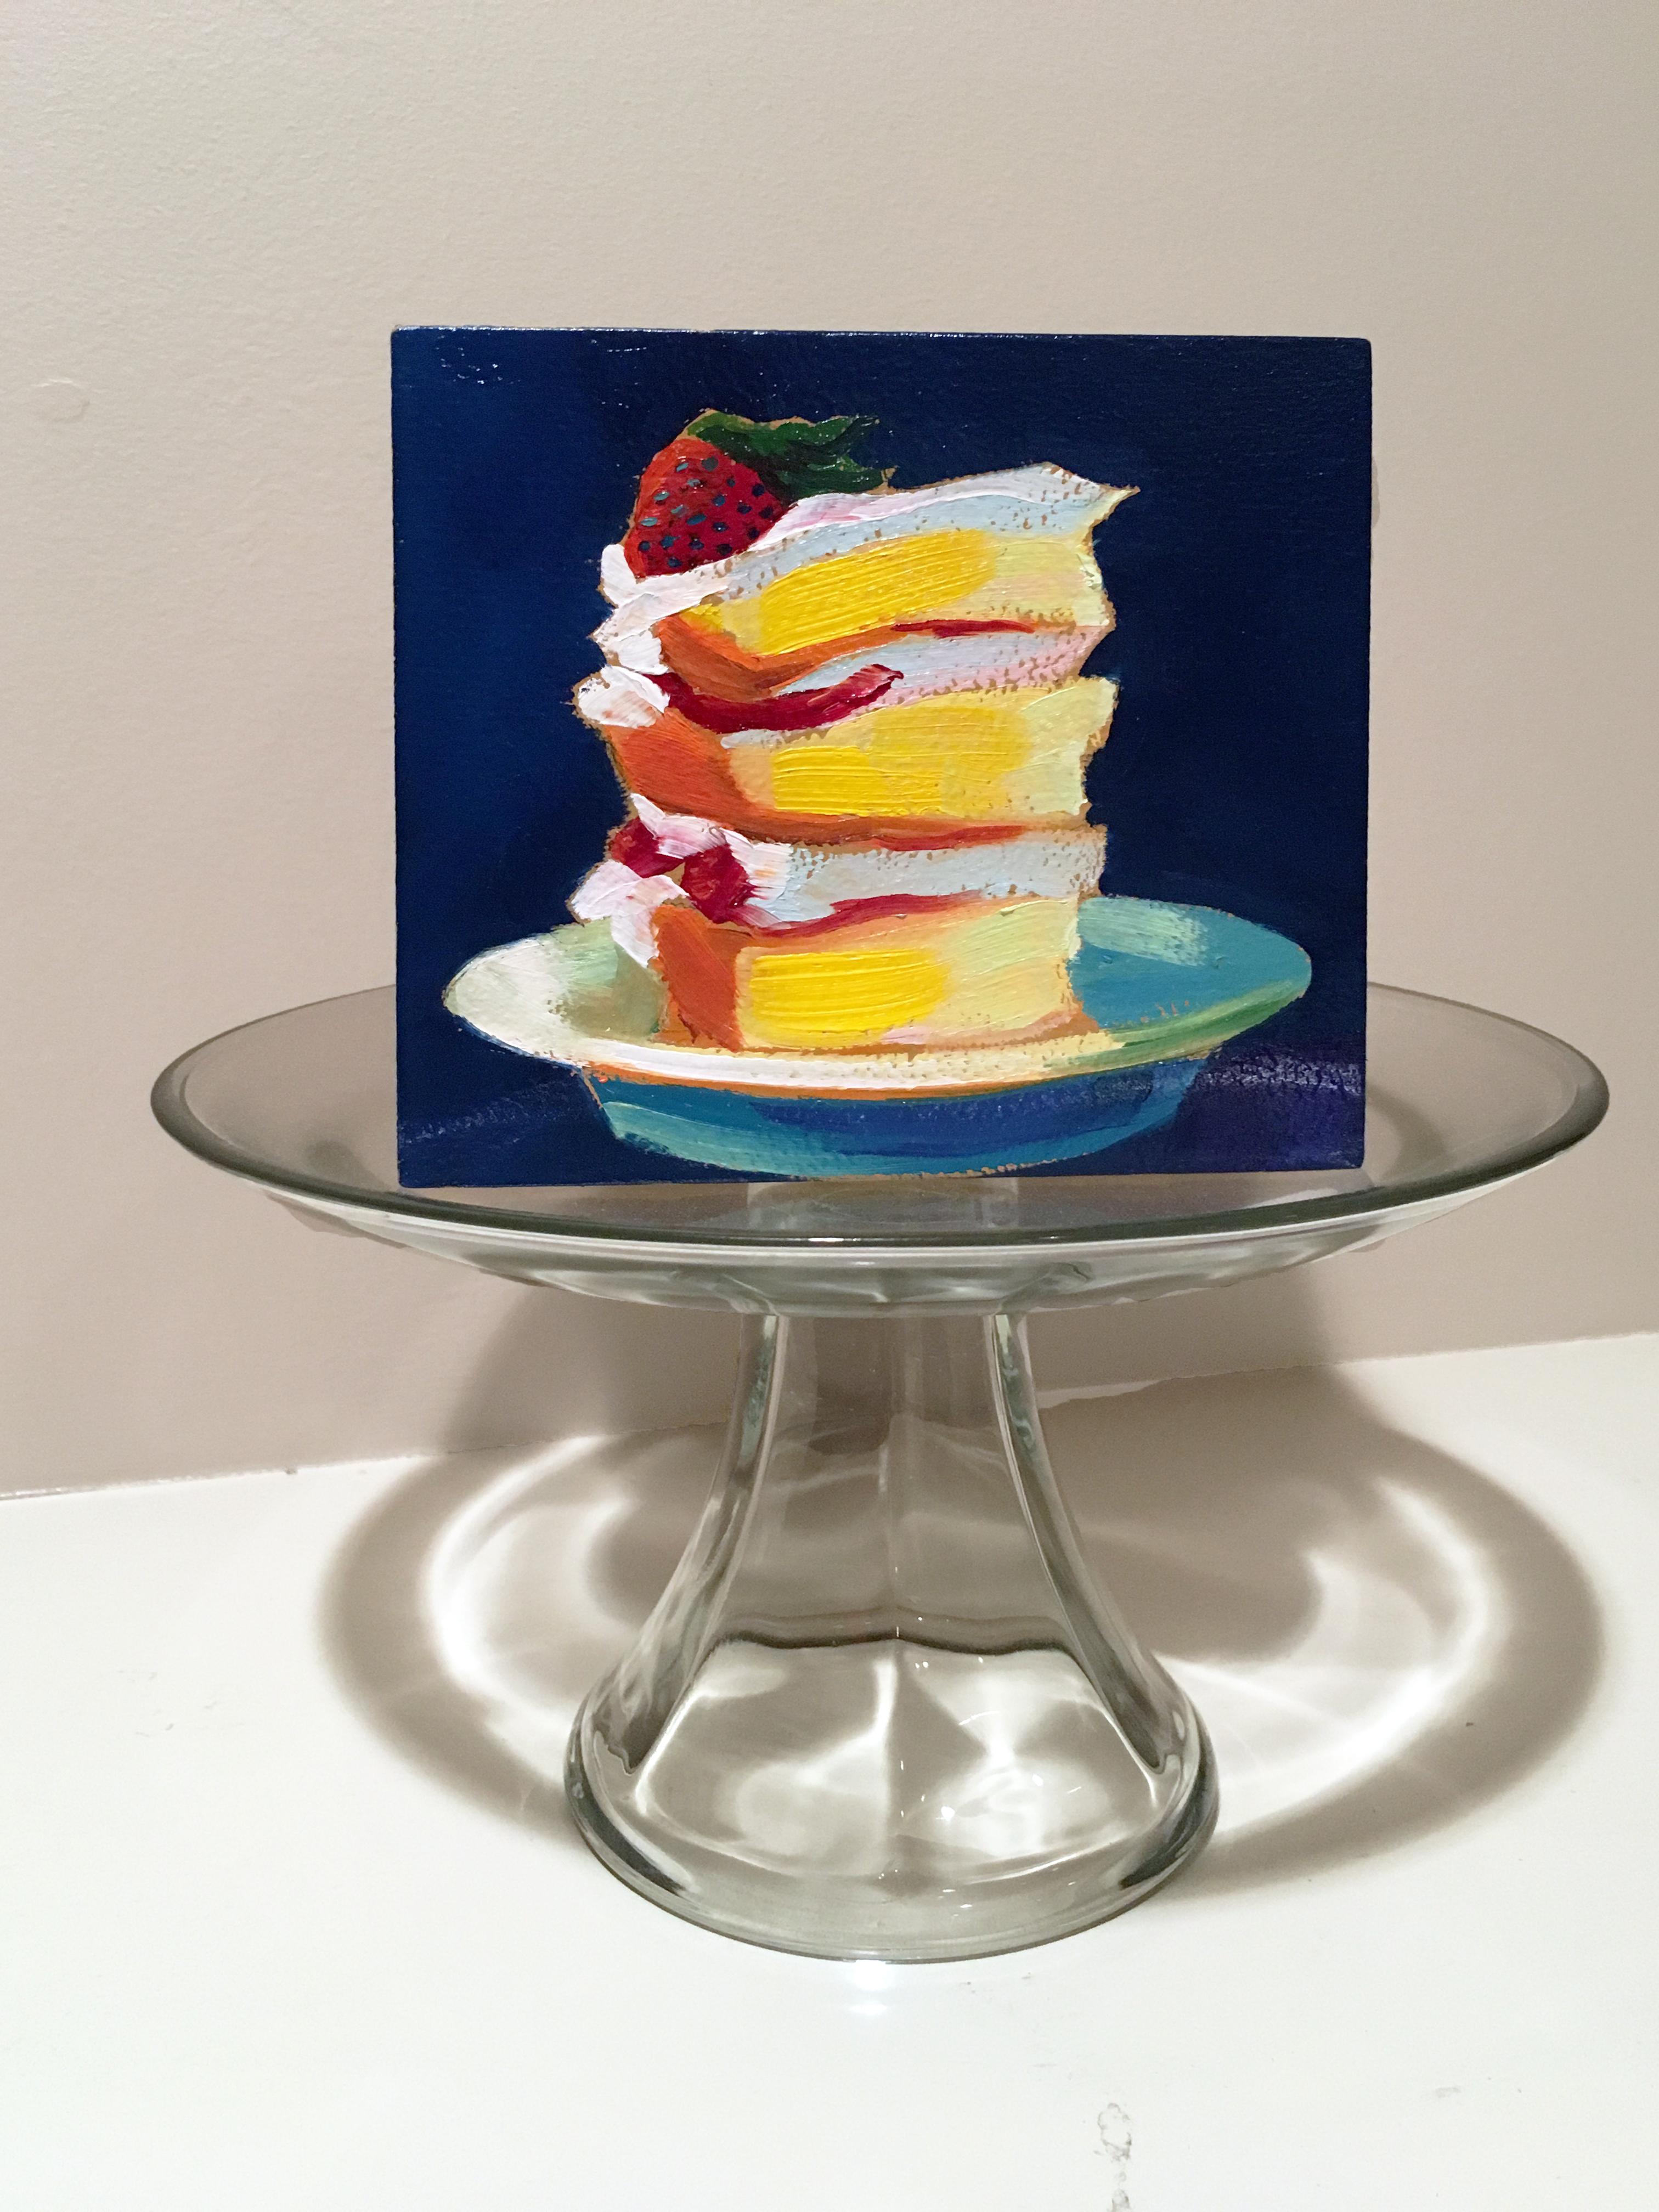 Piece of Cake #1